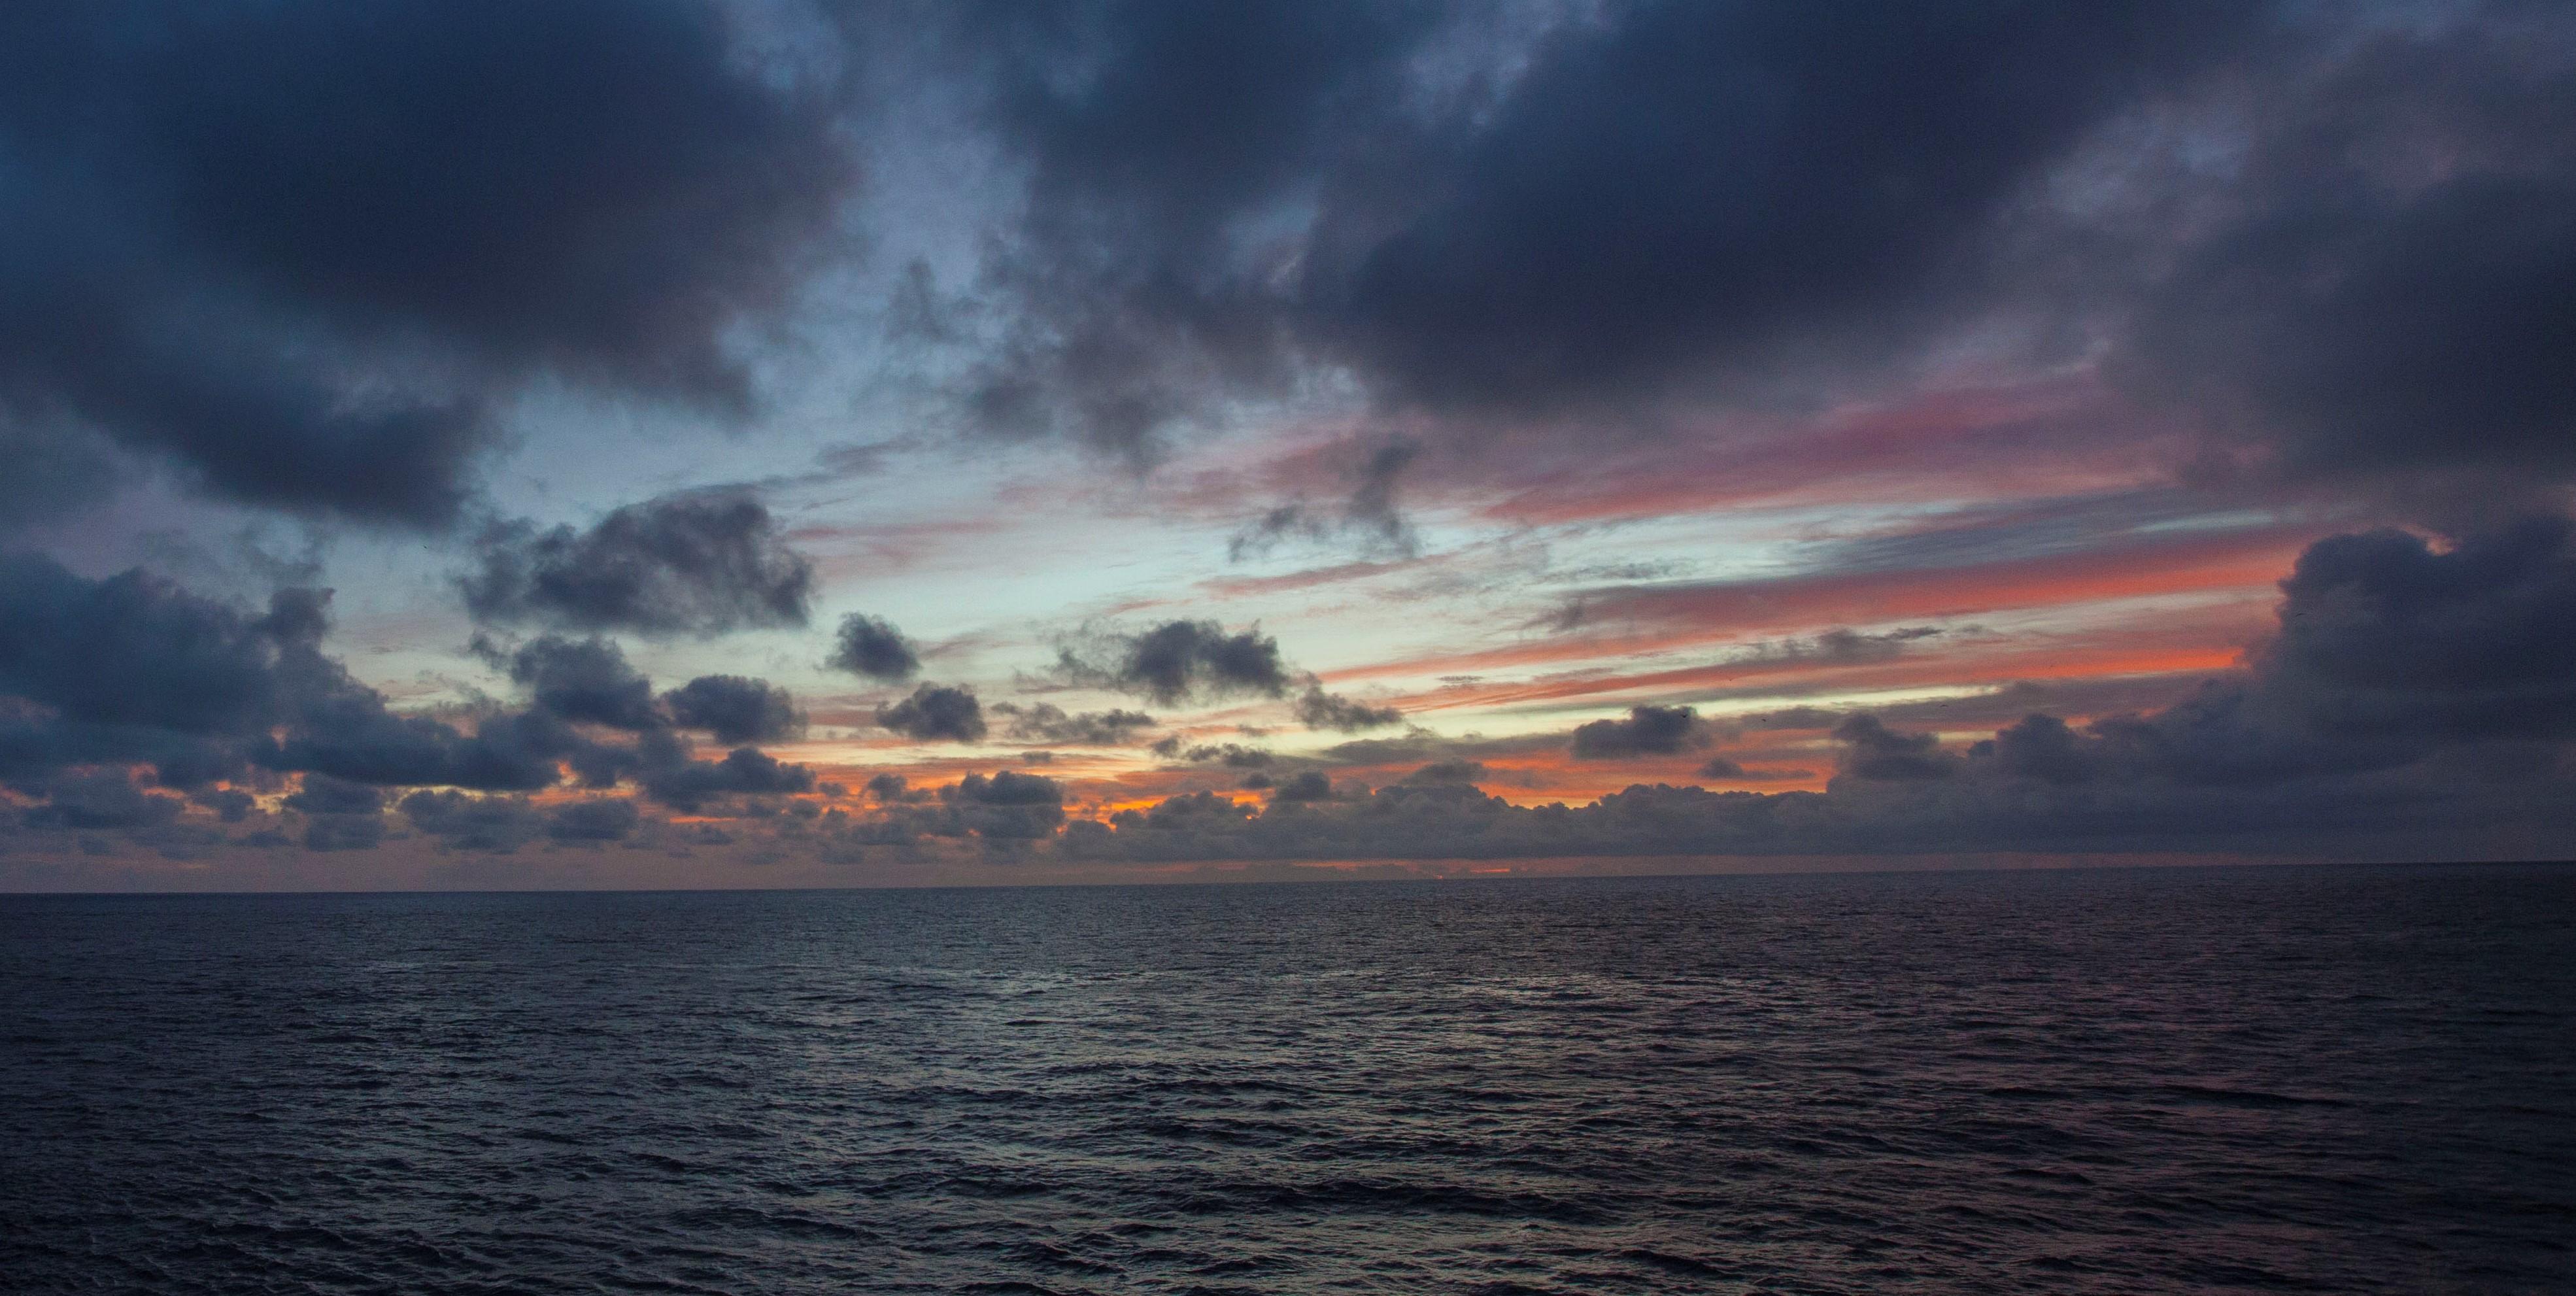 Sunset sky (NASA)